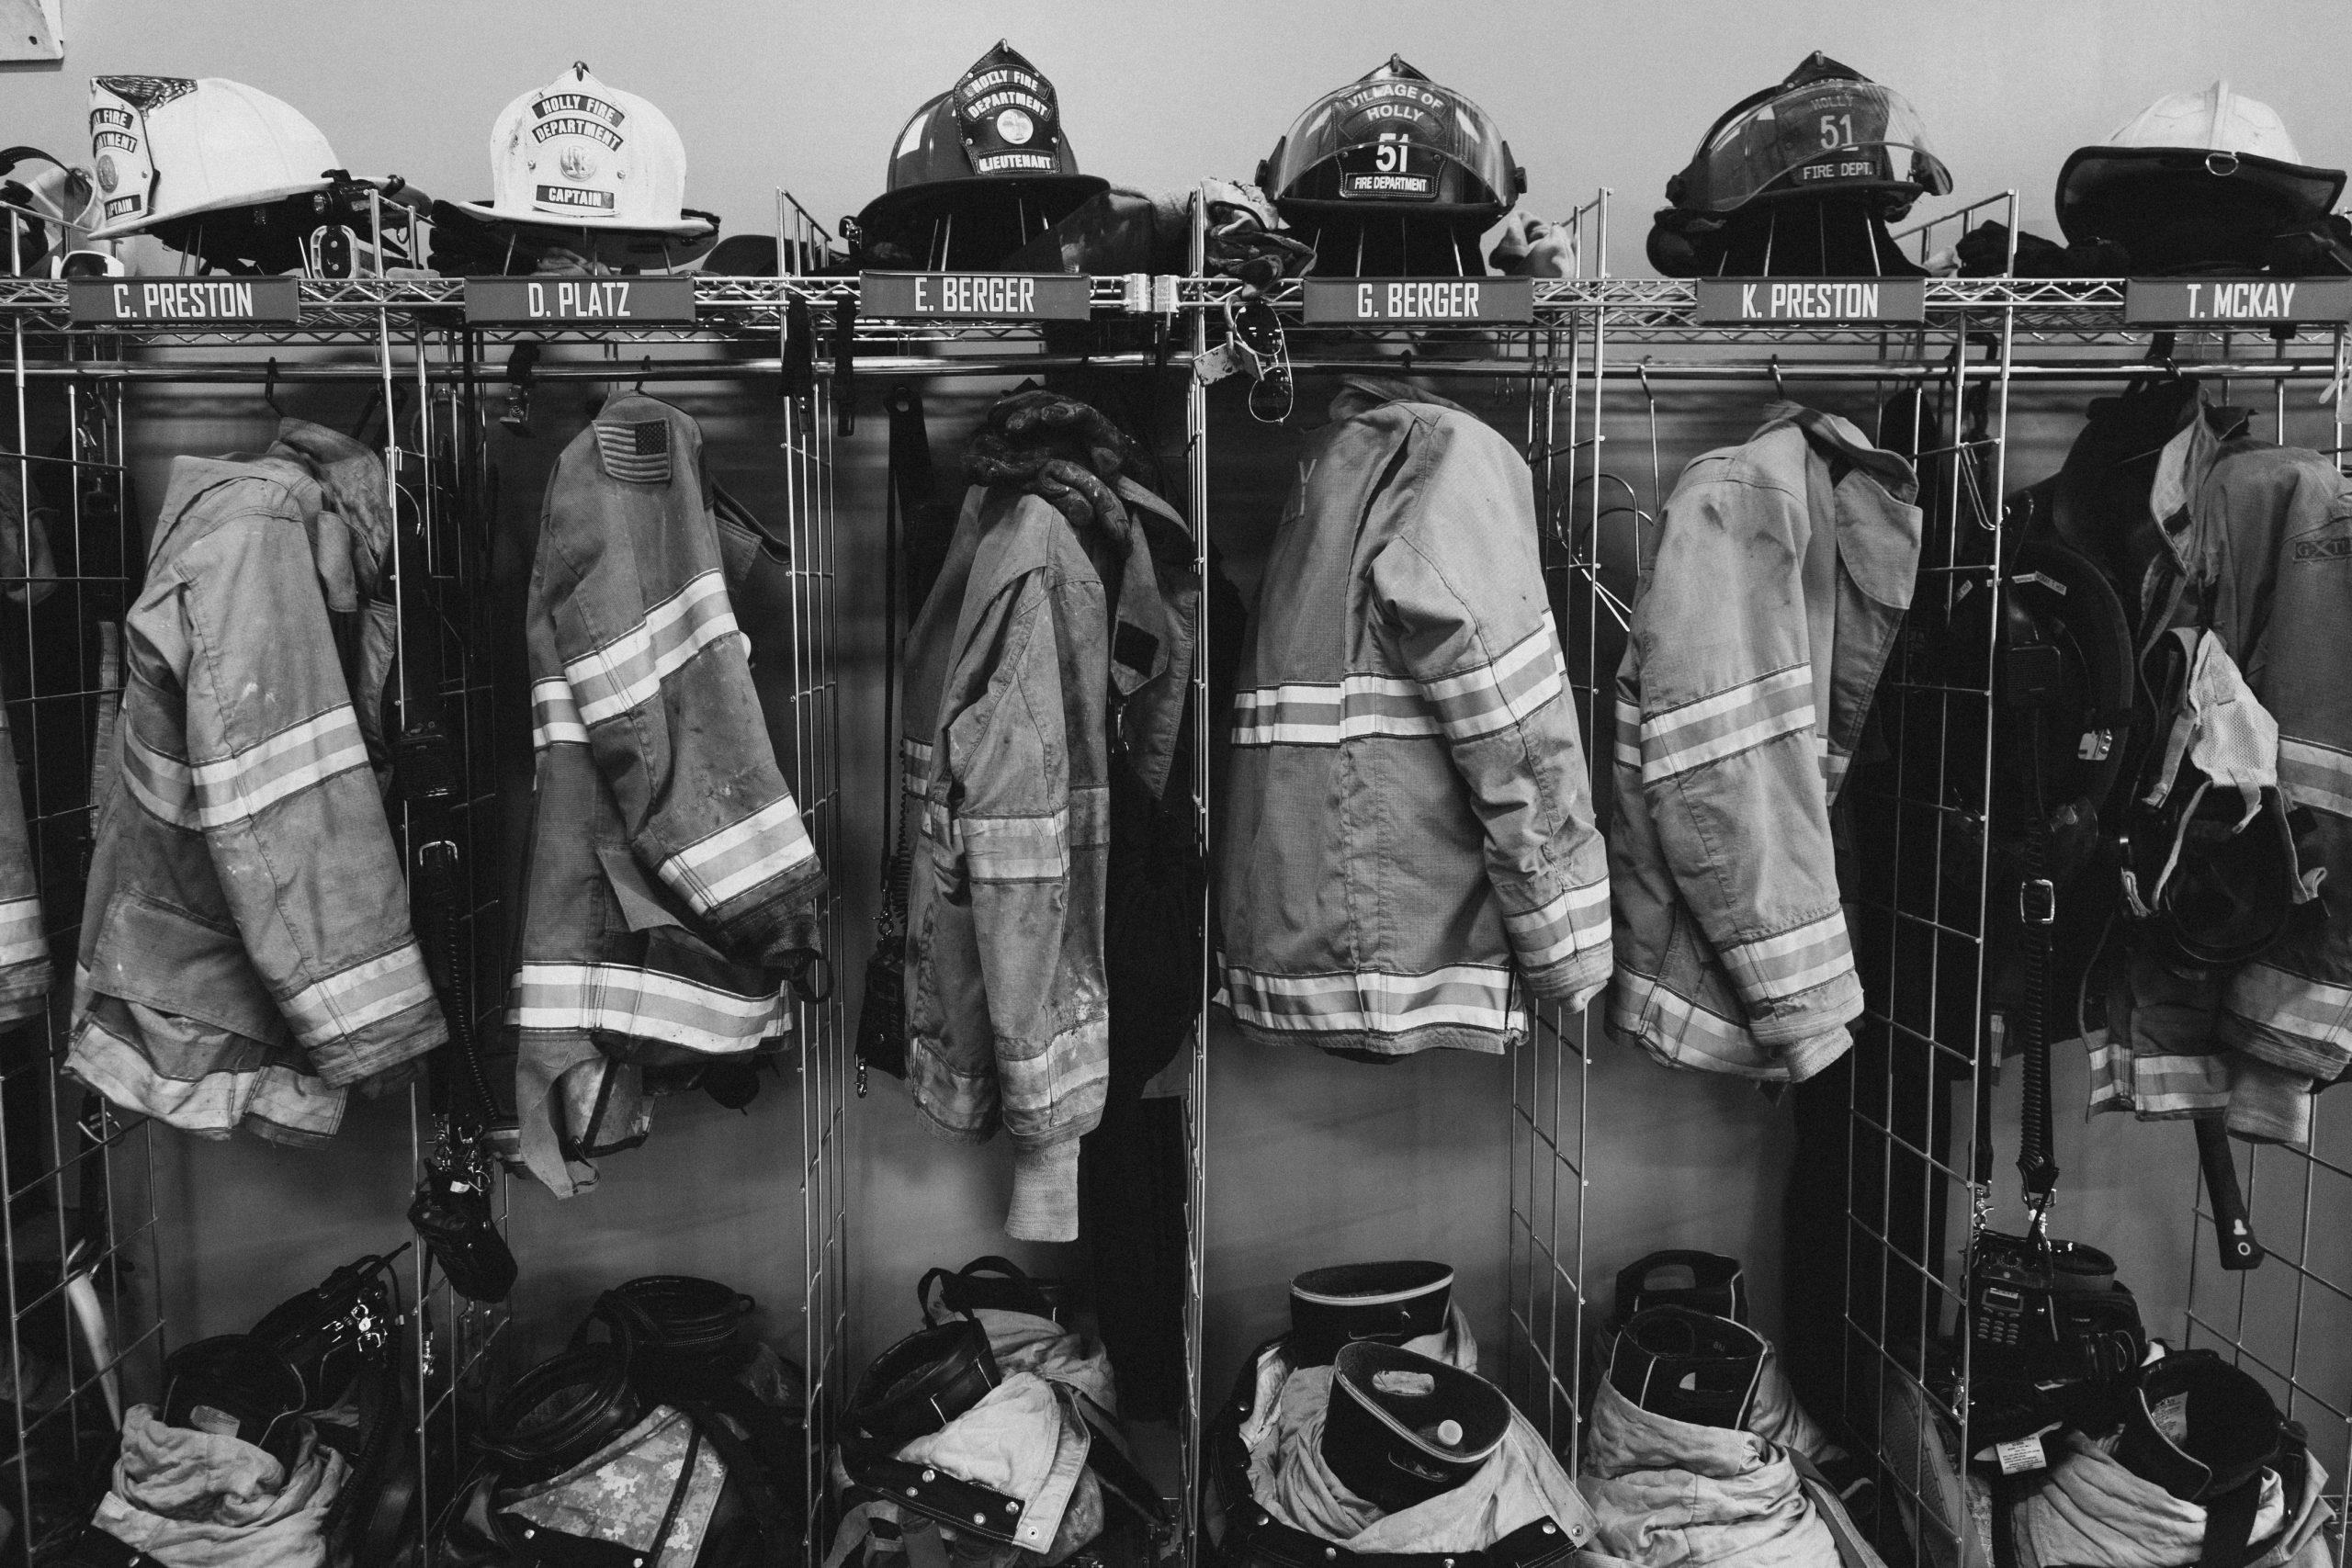 Fireman Lockers